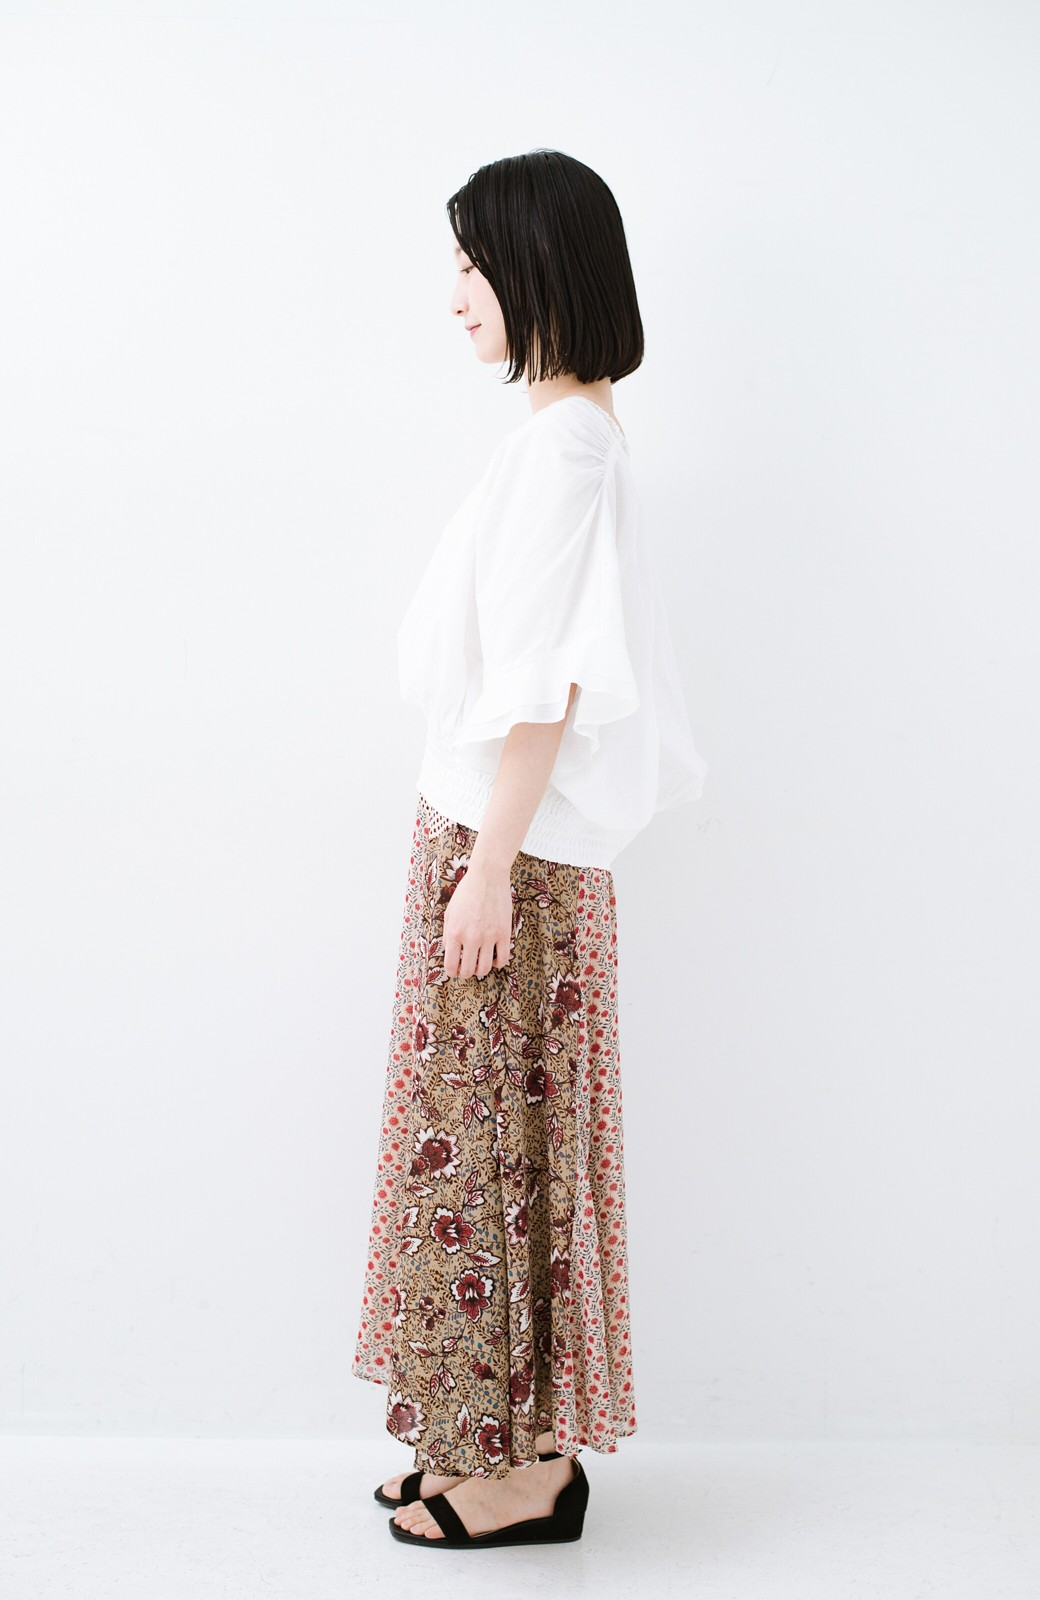 haco! 【洗濯機洗いOK】シンプルなトップスに合わせるだけでかわいくなれる MIX柄スカート <ベージュ系その他>の商品写真18